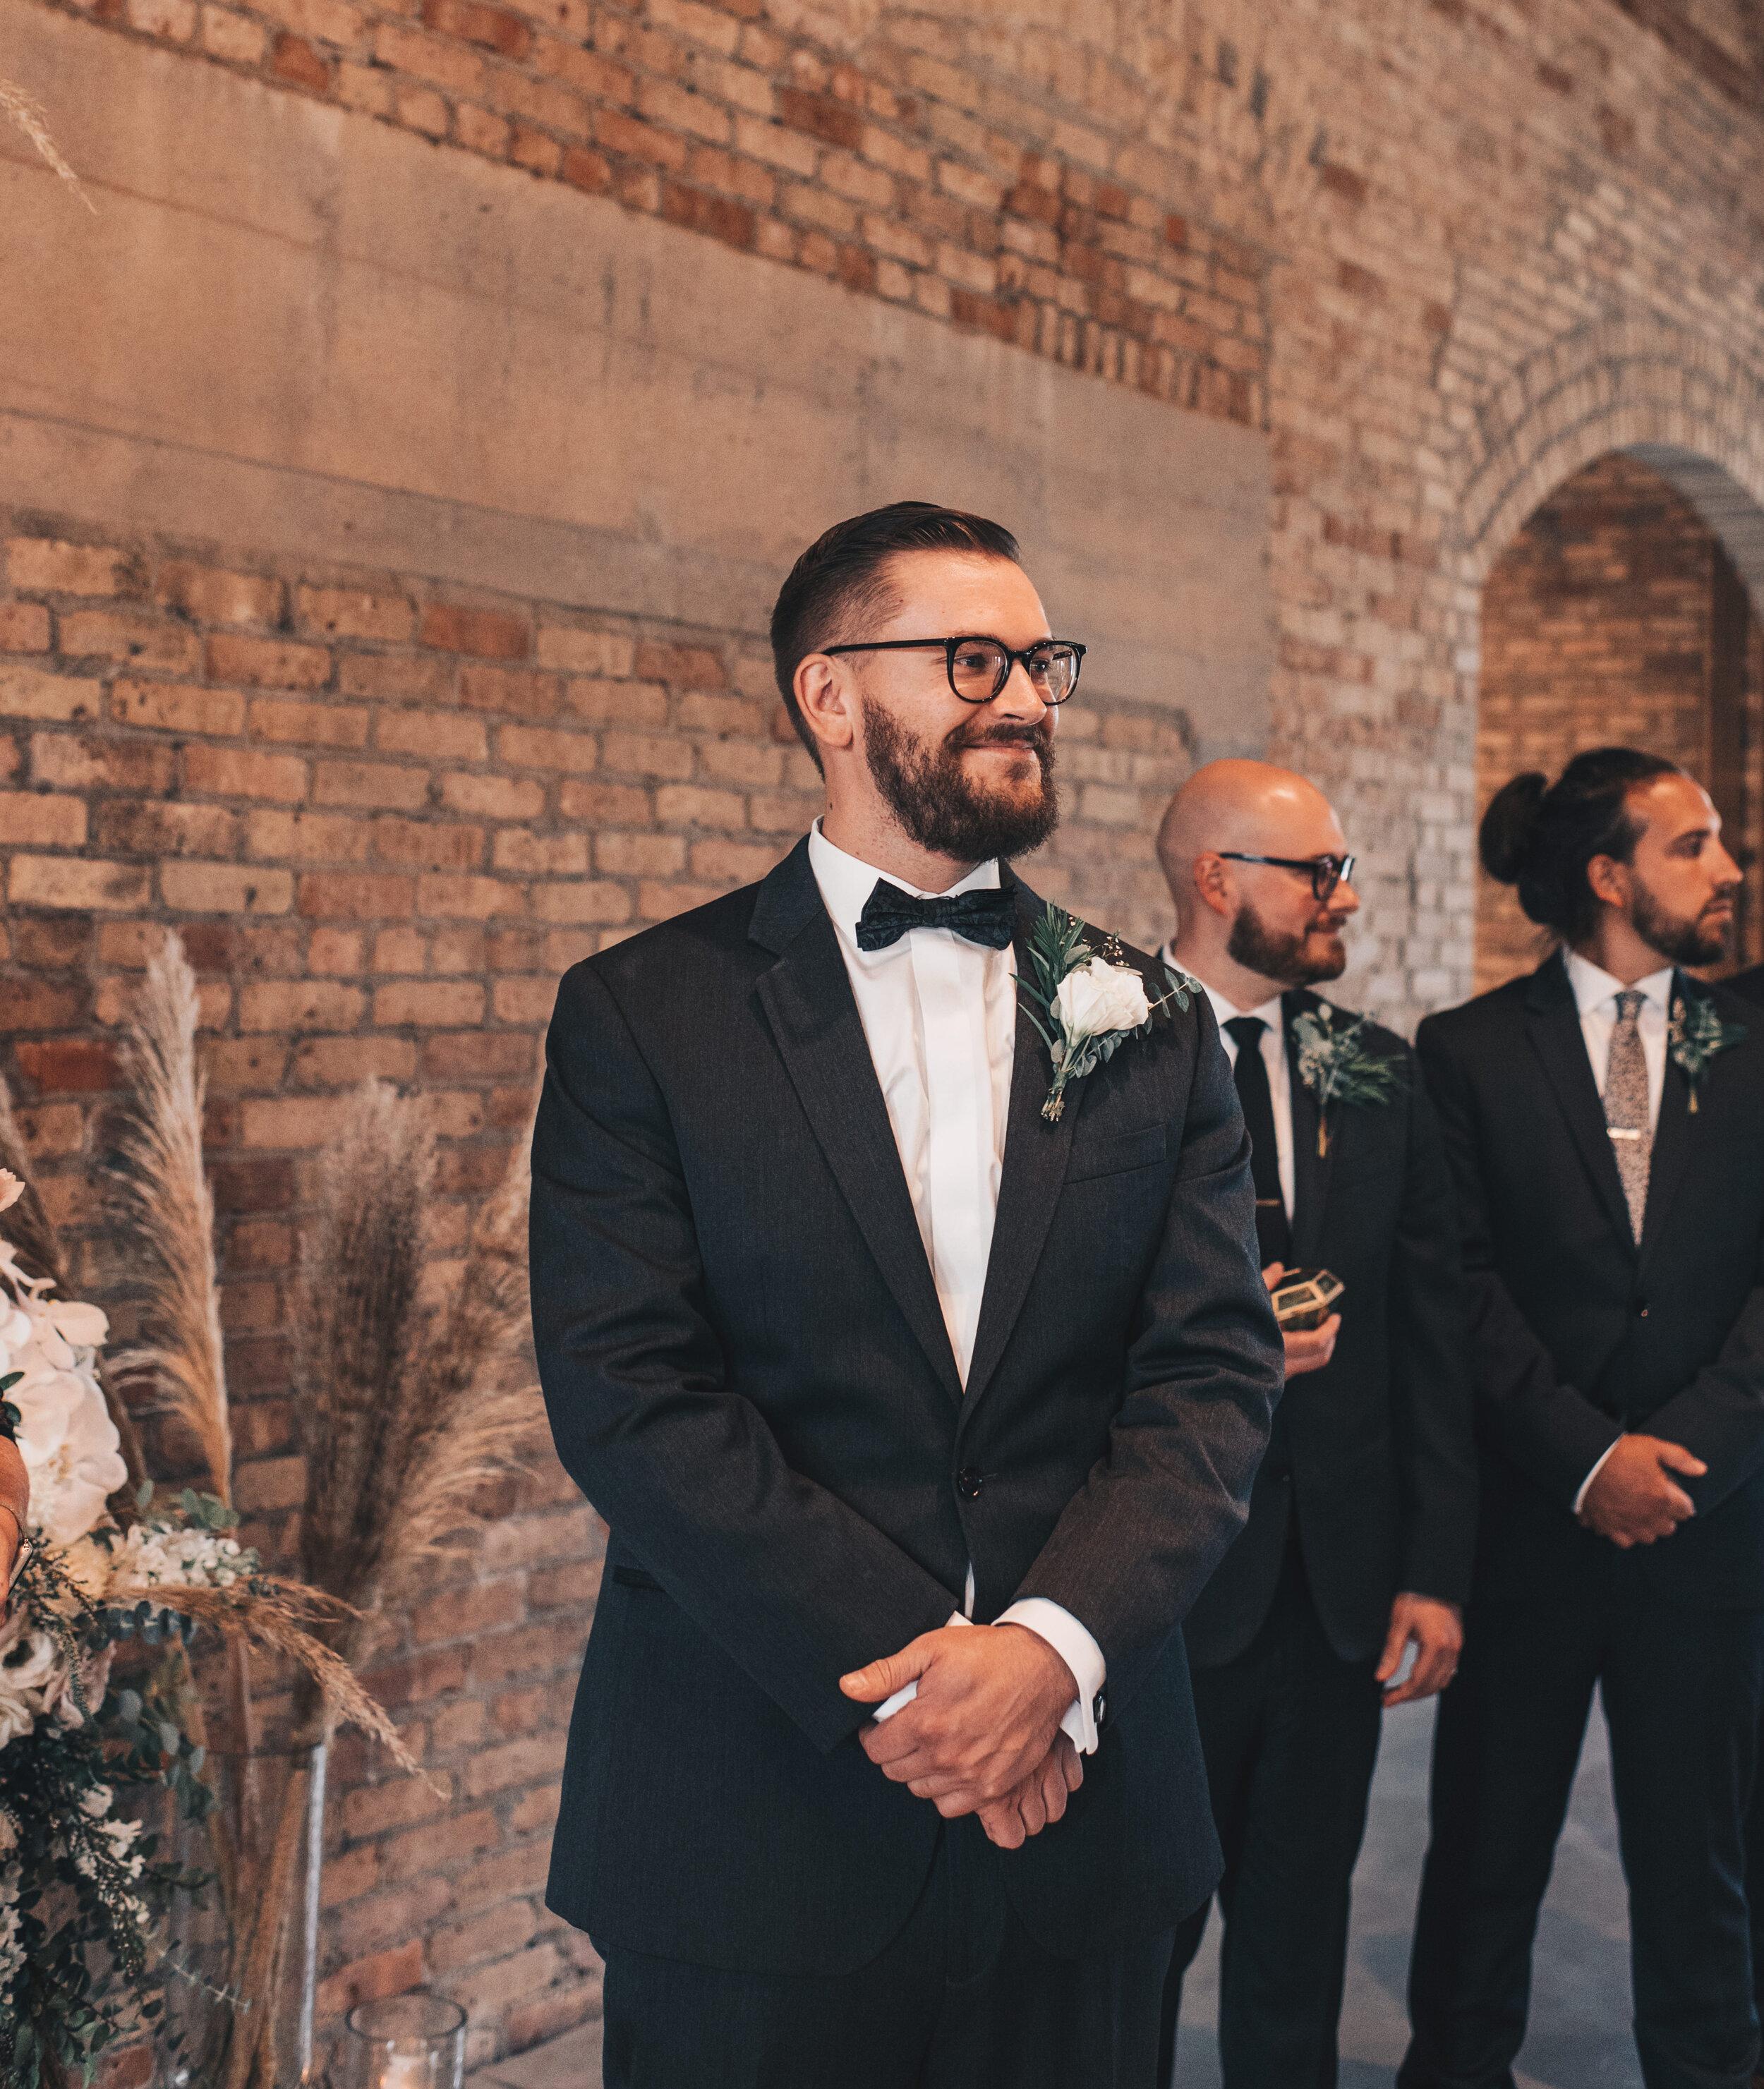 Modern Industrial Wedding, The Brix on the Fox, The BRIX, Wedding Detail Photos, Modern Midwest Wedding, The Brix on the Fox Wedding, The BRIX Wedding